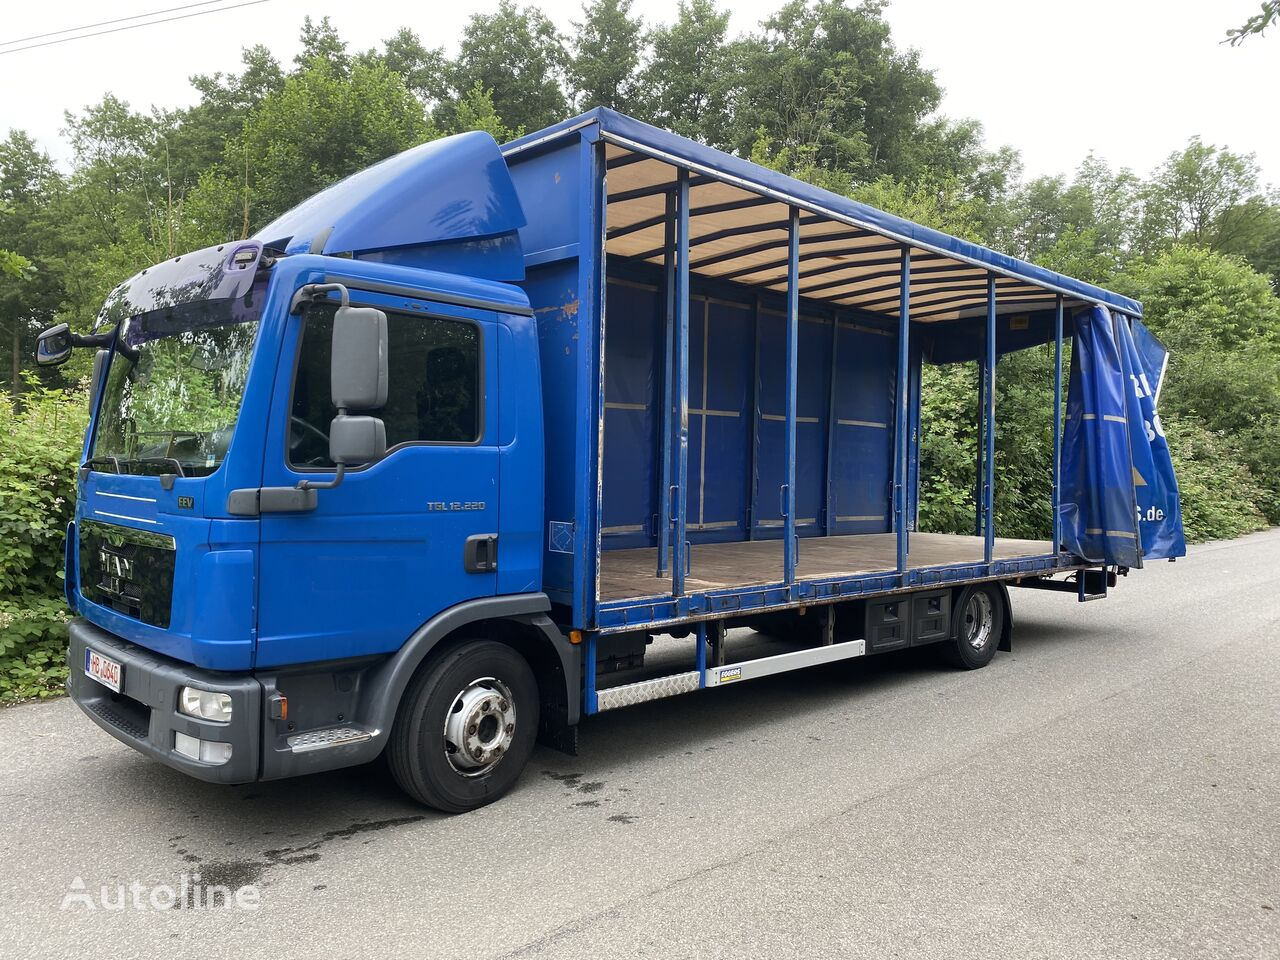 MAN TGL 12.220 BL EEV , 7,20m , 6-Gänge manuall, Klima, TOP kamion s ceradom